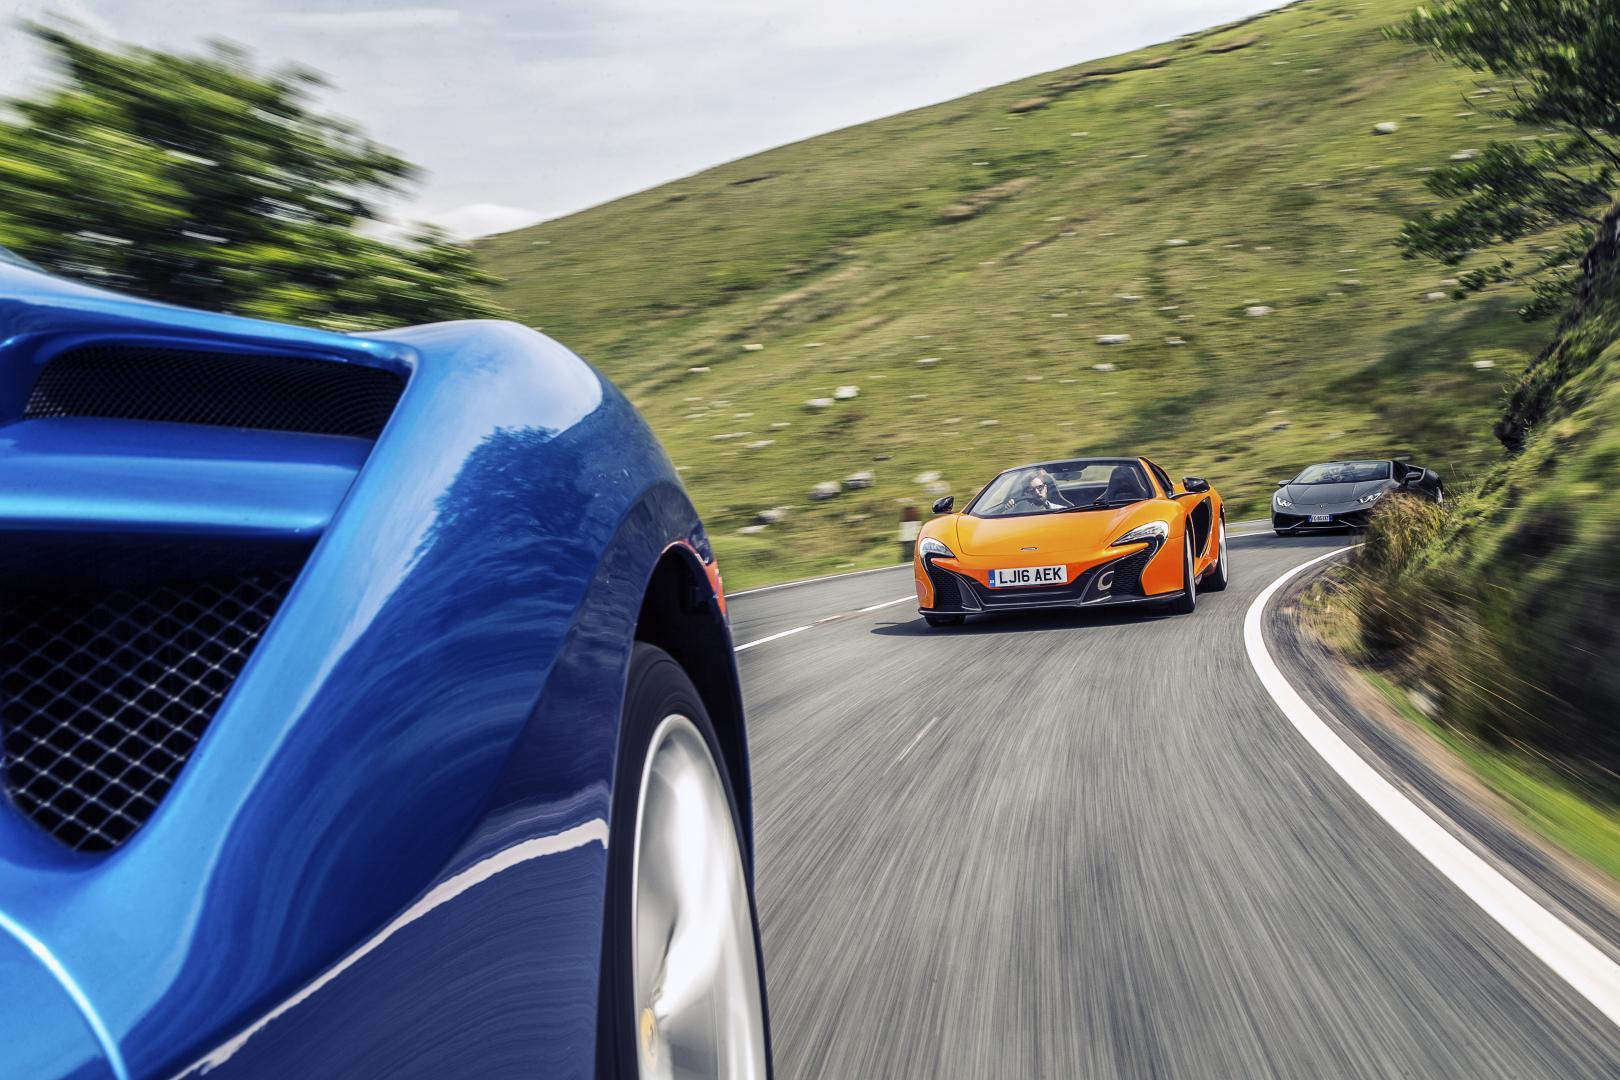 Lamborghini Huracán Spyder vs Ferrari 488 Spider vs McLaren 650S Spider